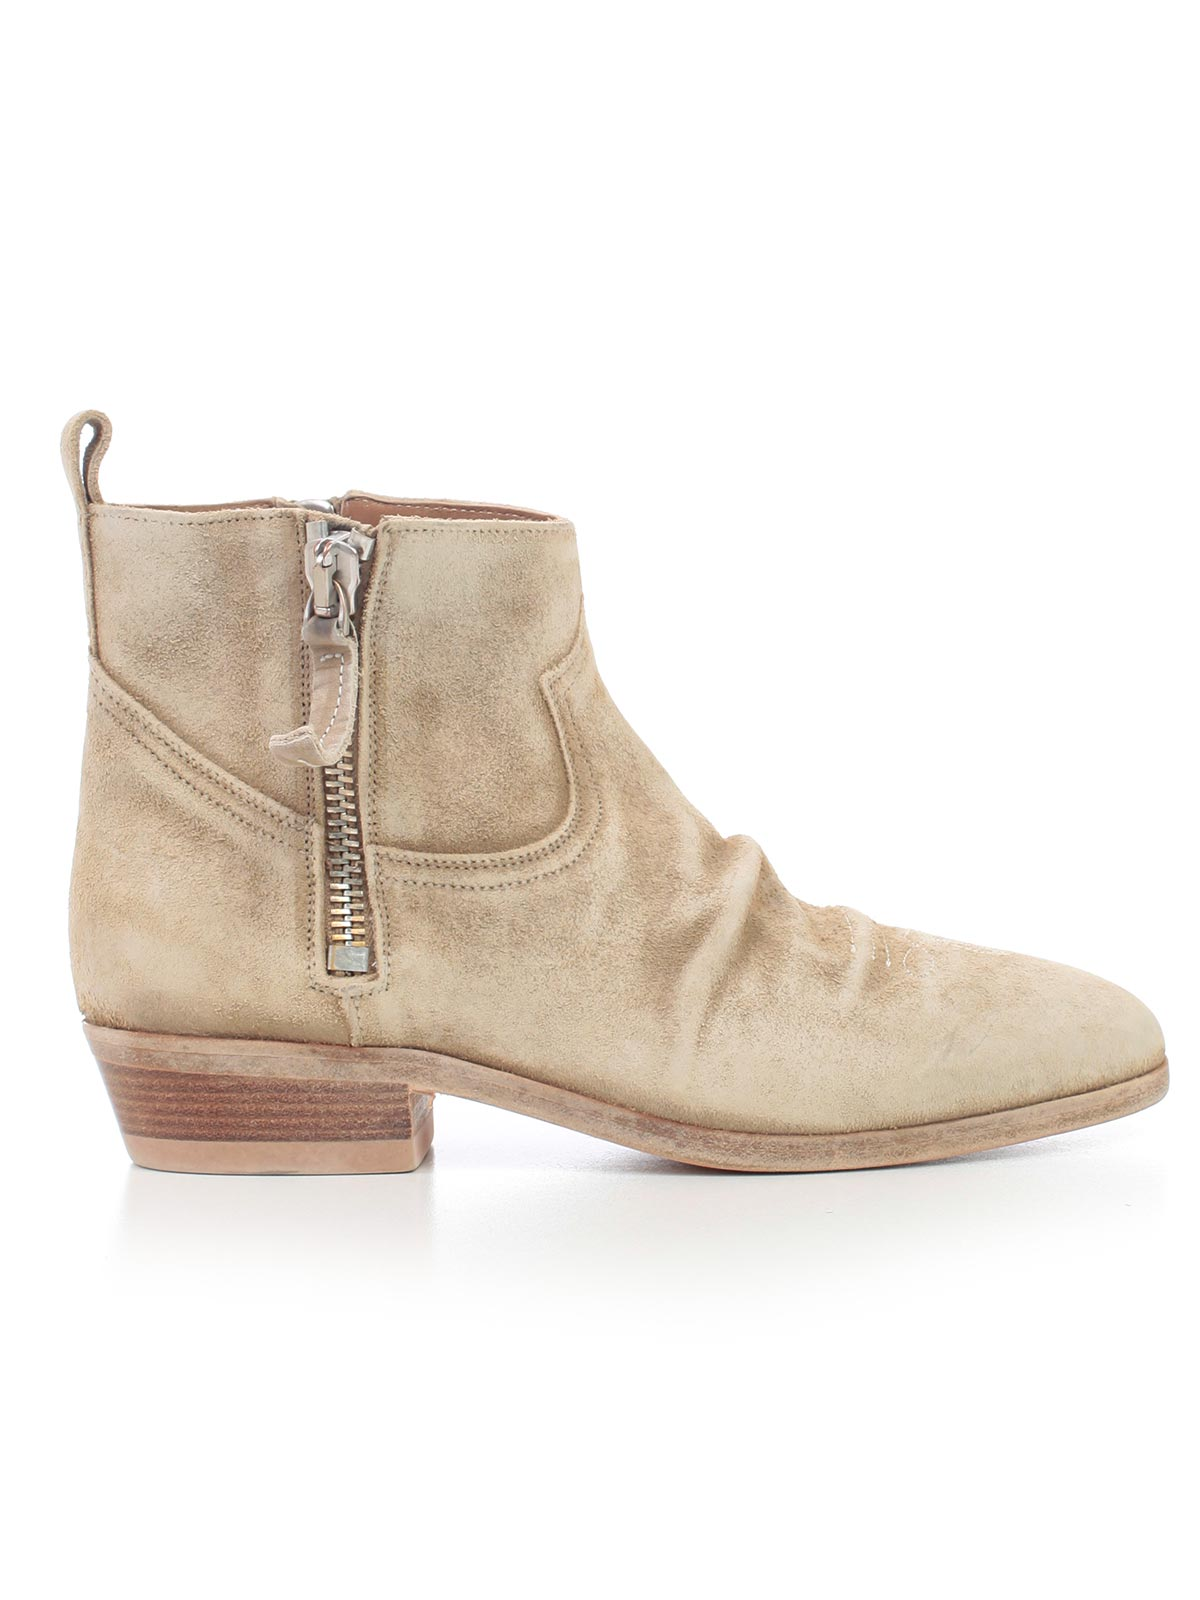 Golden Goose Deluxe Brand Shoes